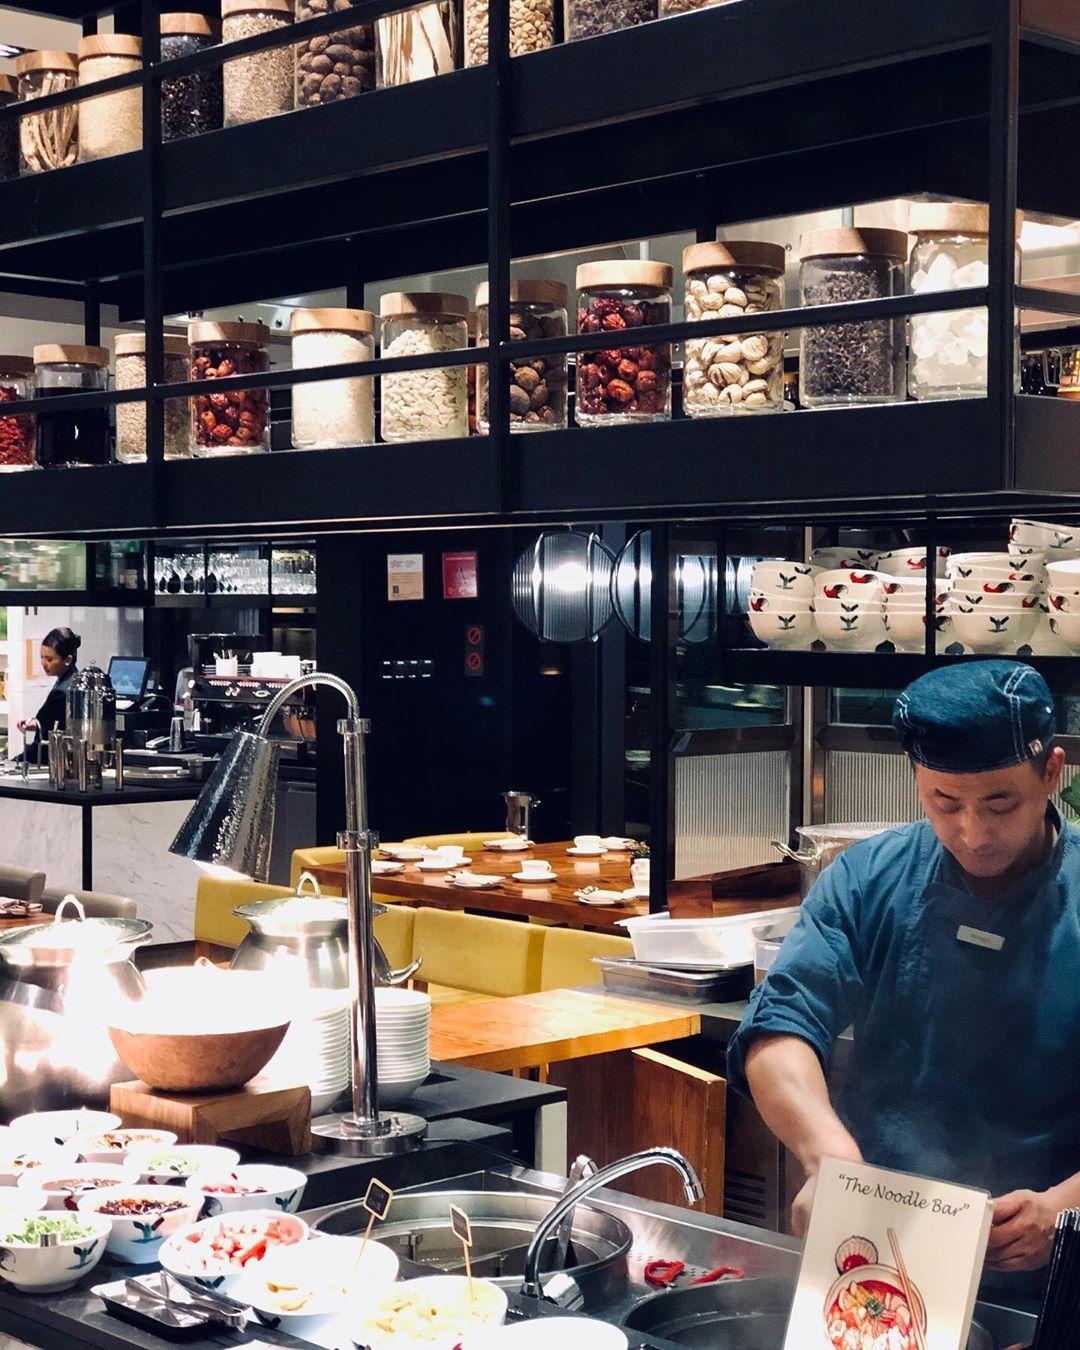 Ilustrasi chef sedang meracik pesanan pelanggan. Instagram @chefraheel